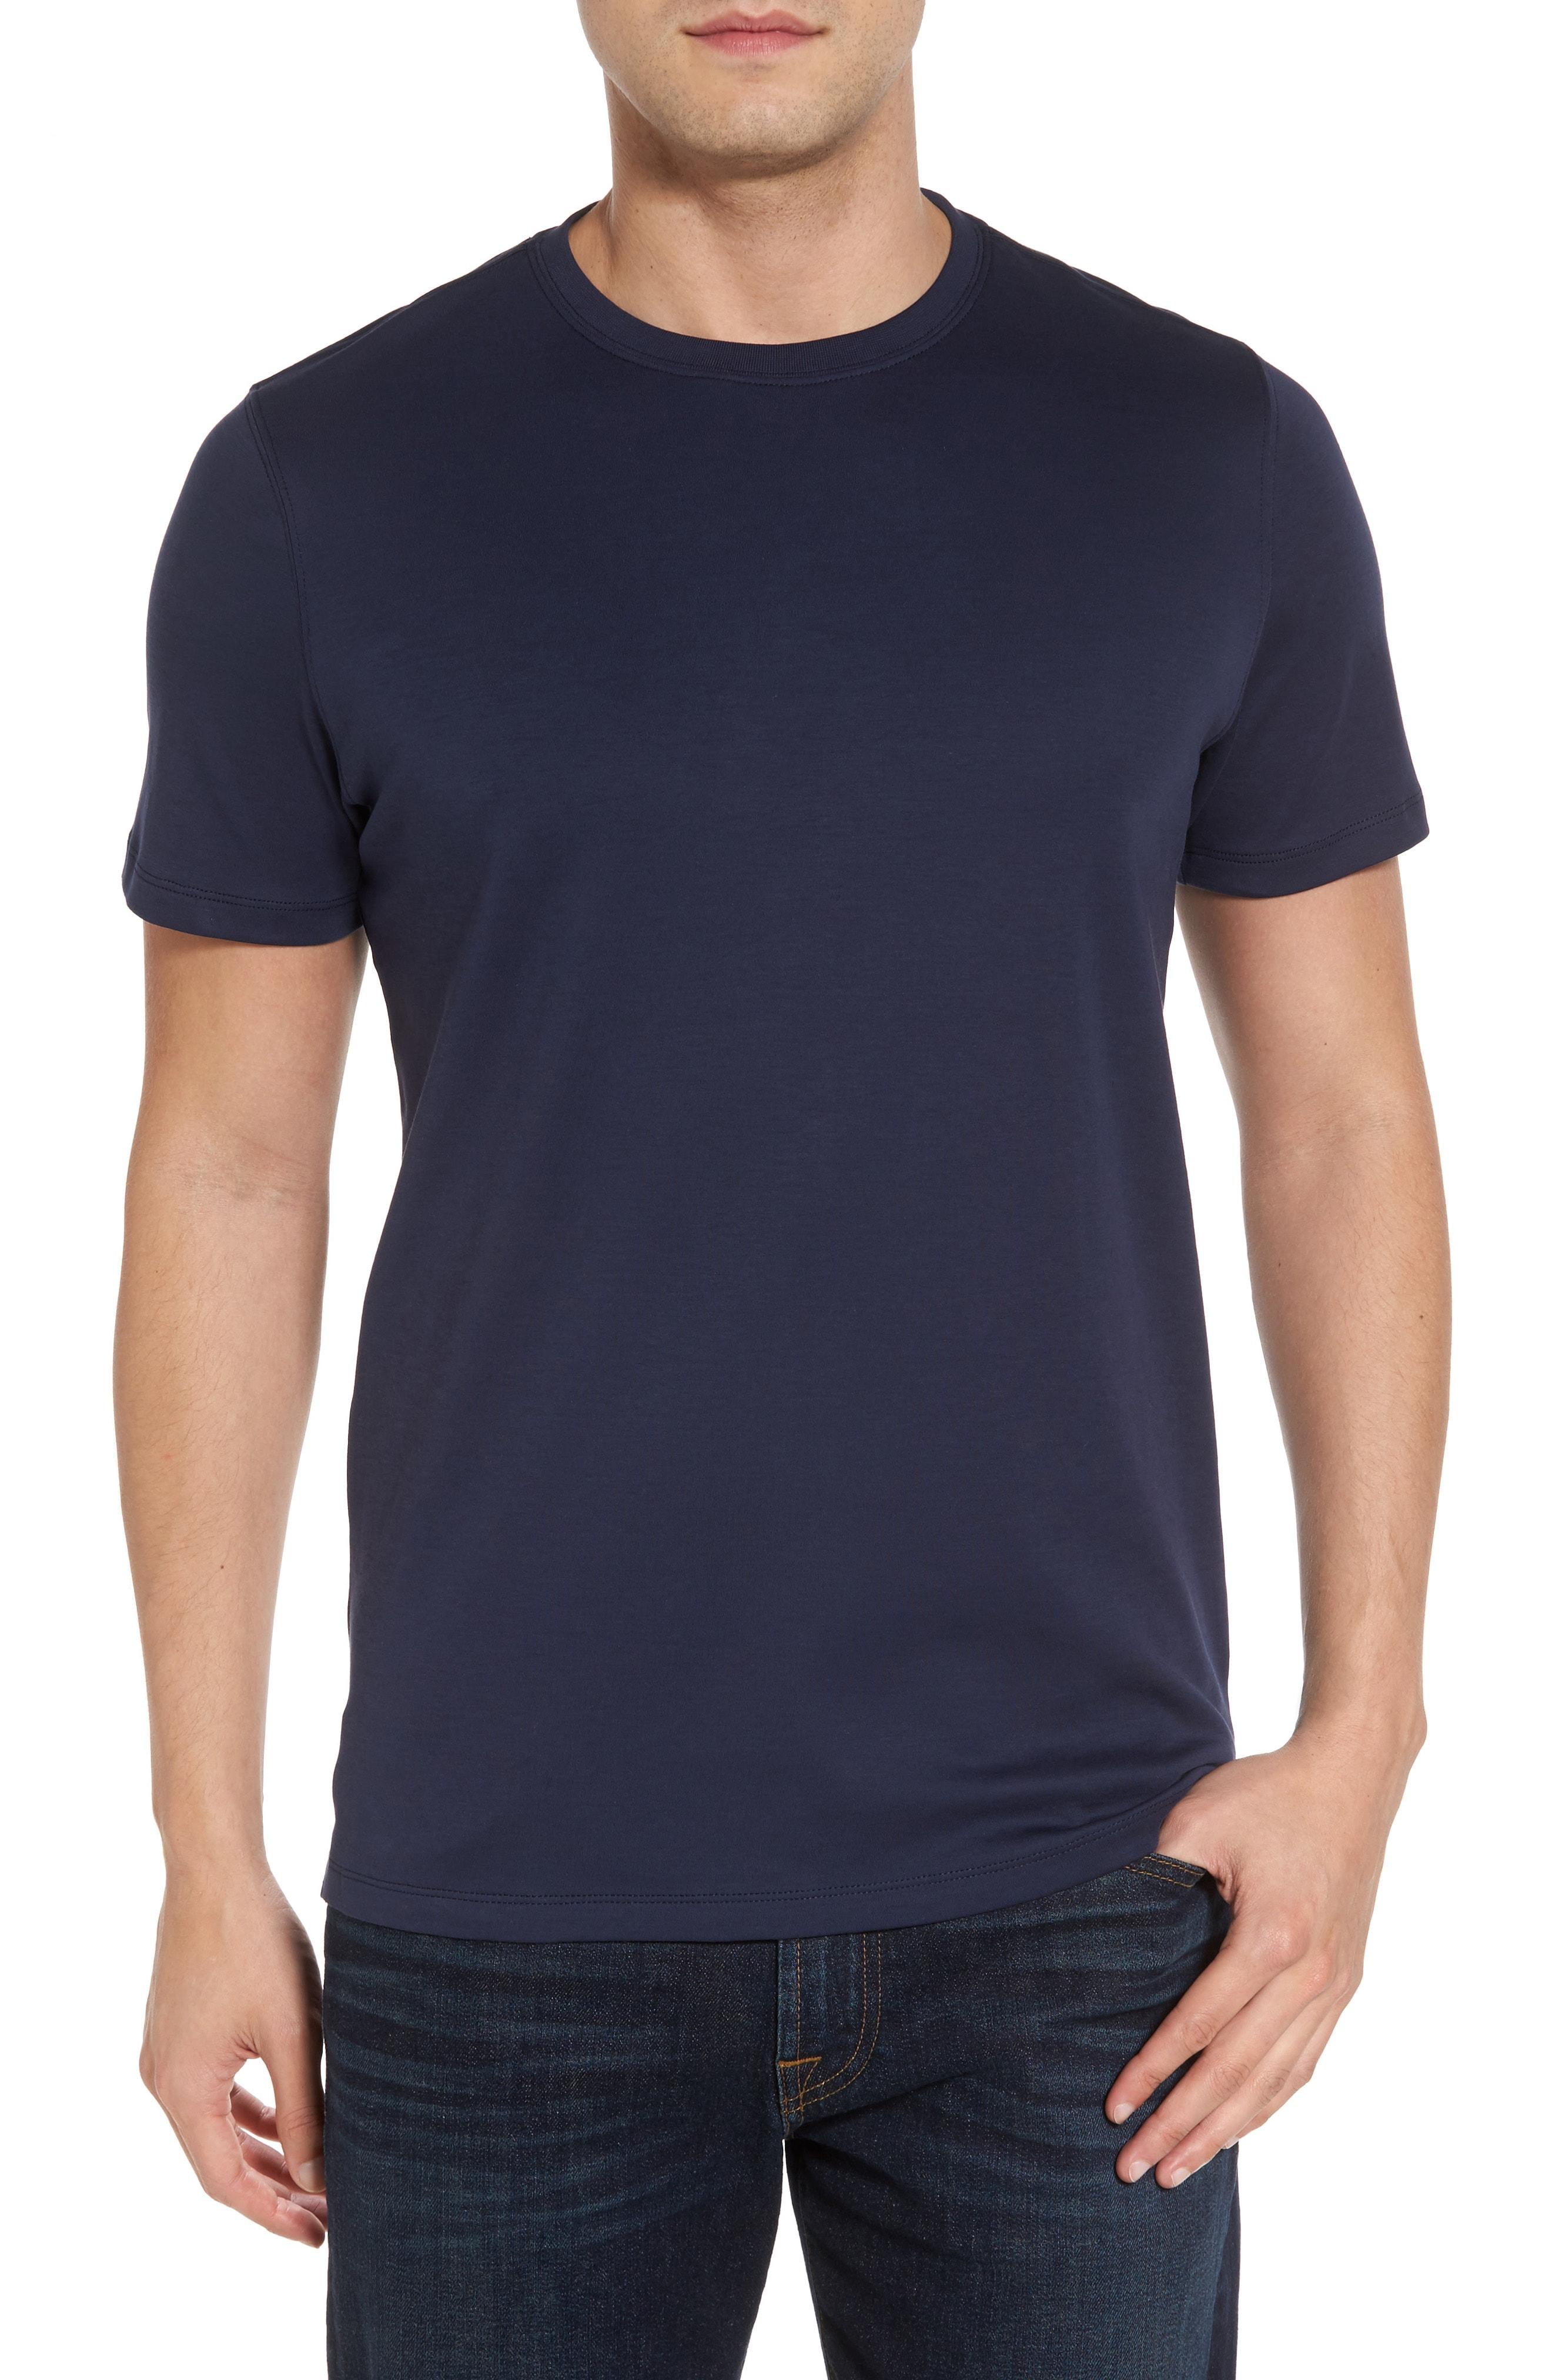 Robert Barakett 'Georgia' Crewneck T-Shirt